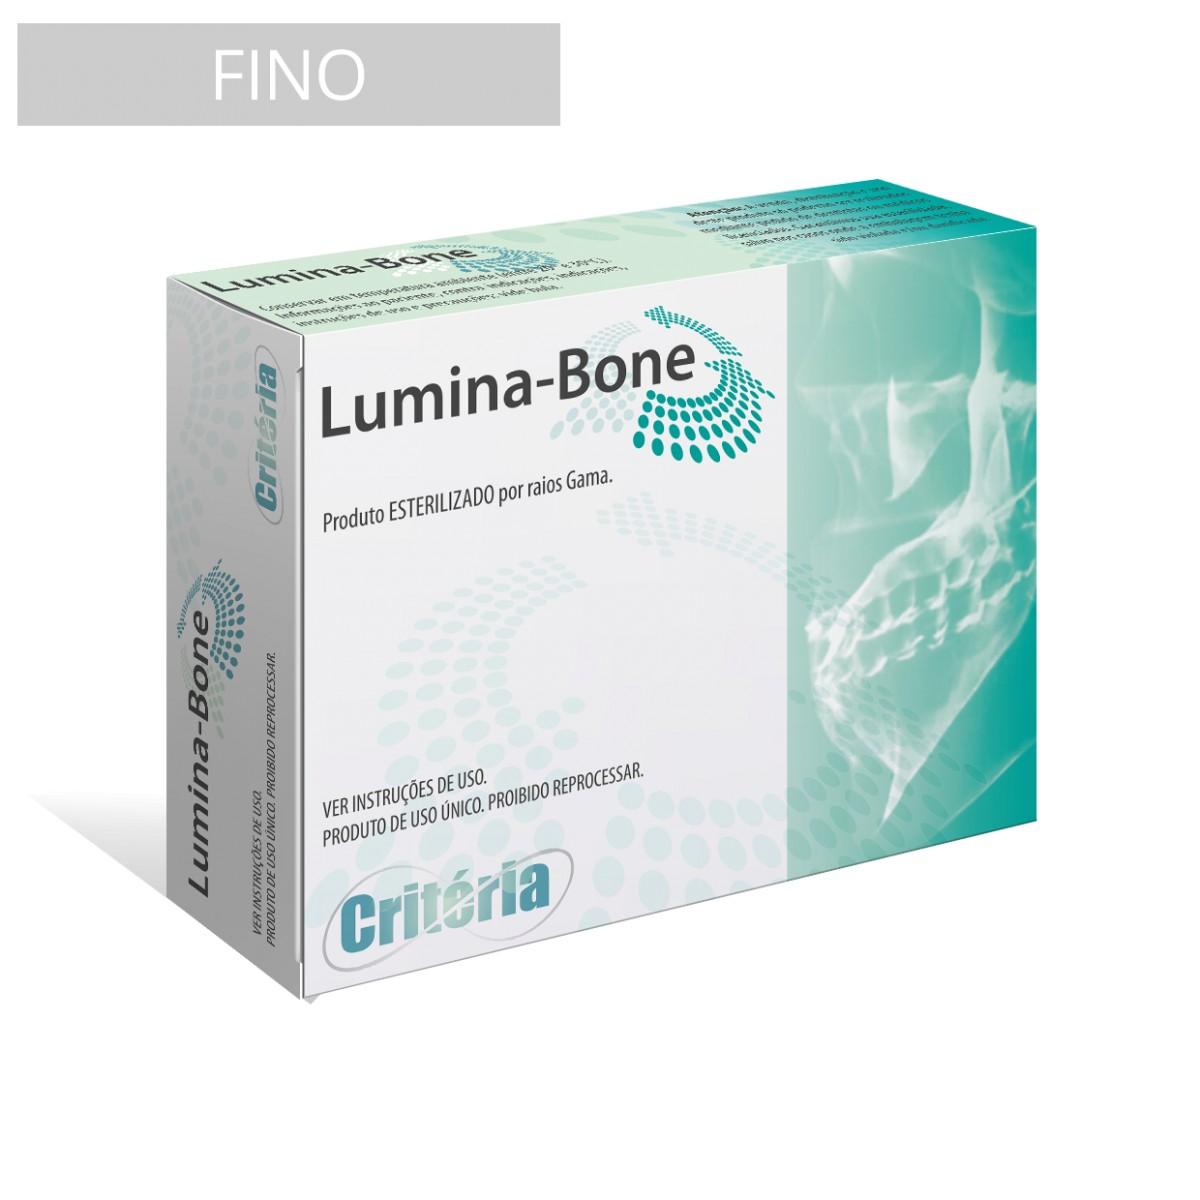 Foto 1 - Enxerto Ósseo LUMINA-BONE Fino 0,5g